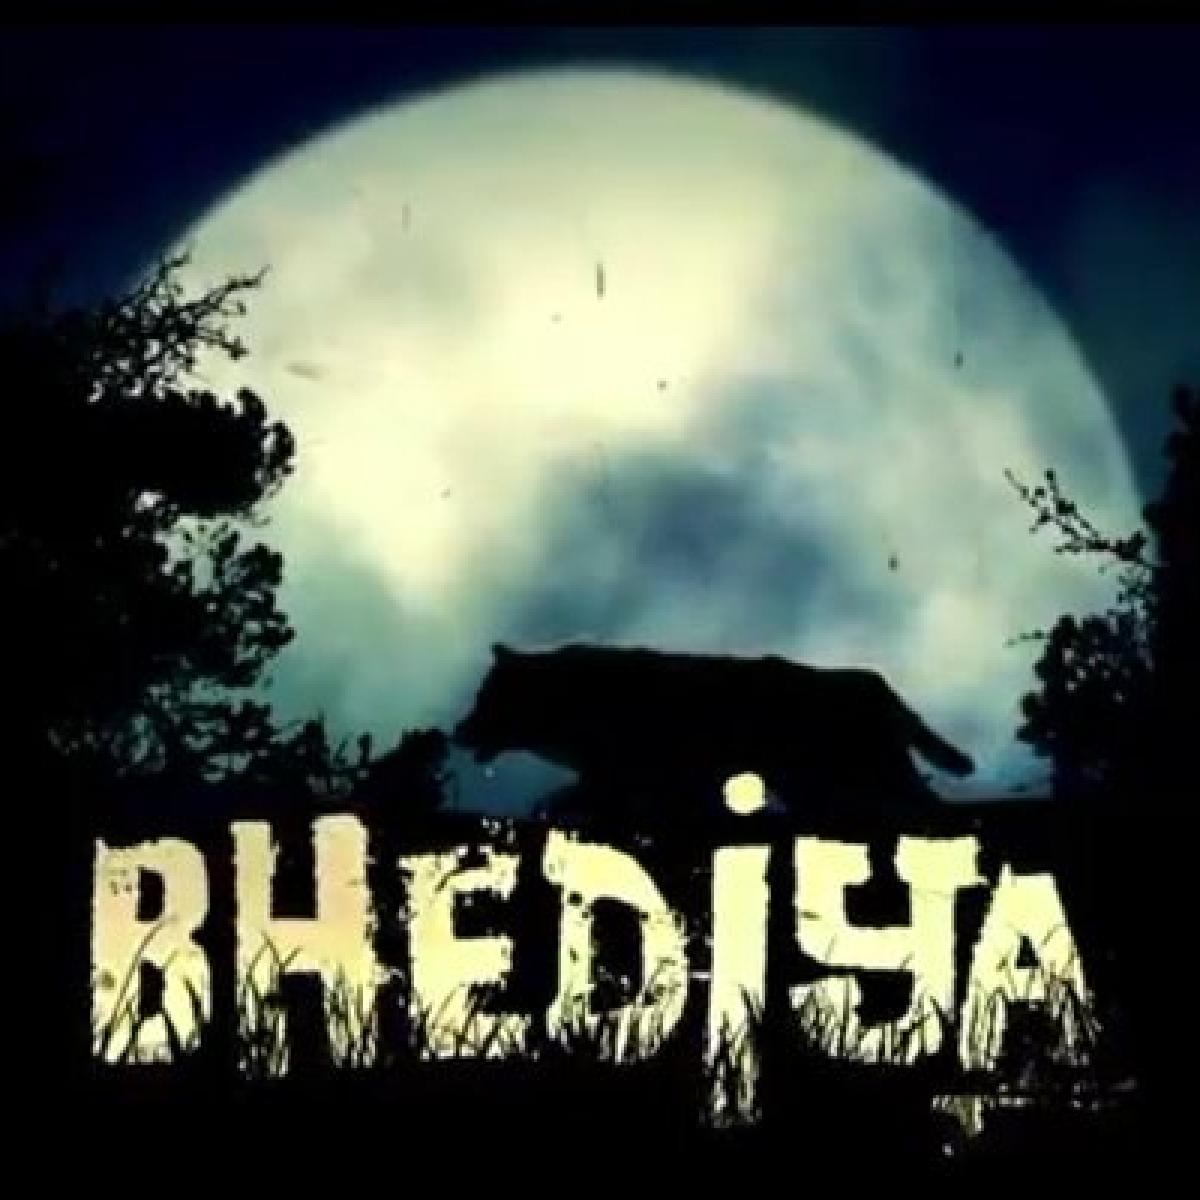 Varun Dhawan, Kriti Sanon's 'Bhediya' to release in April 2022; check out teaser